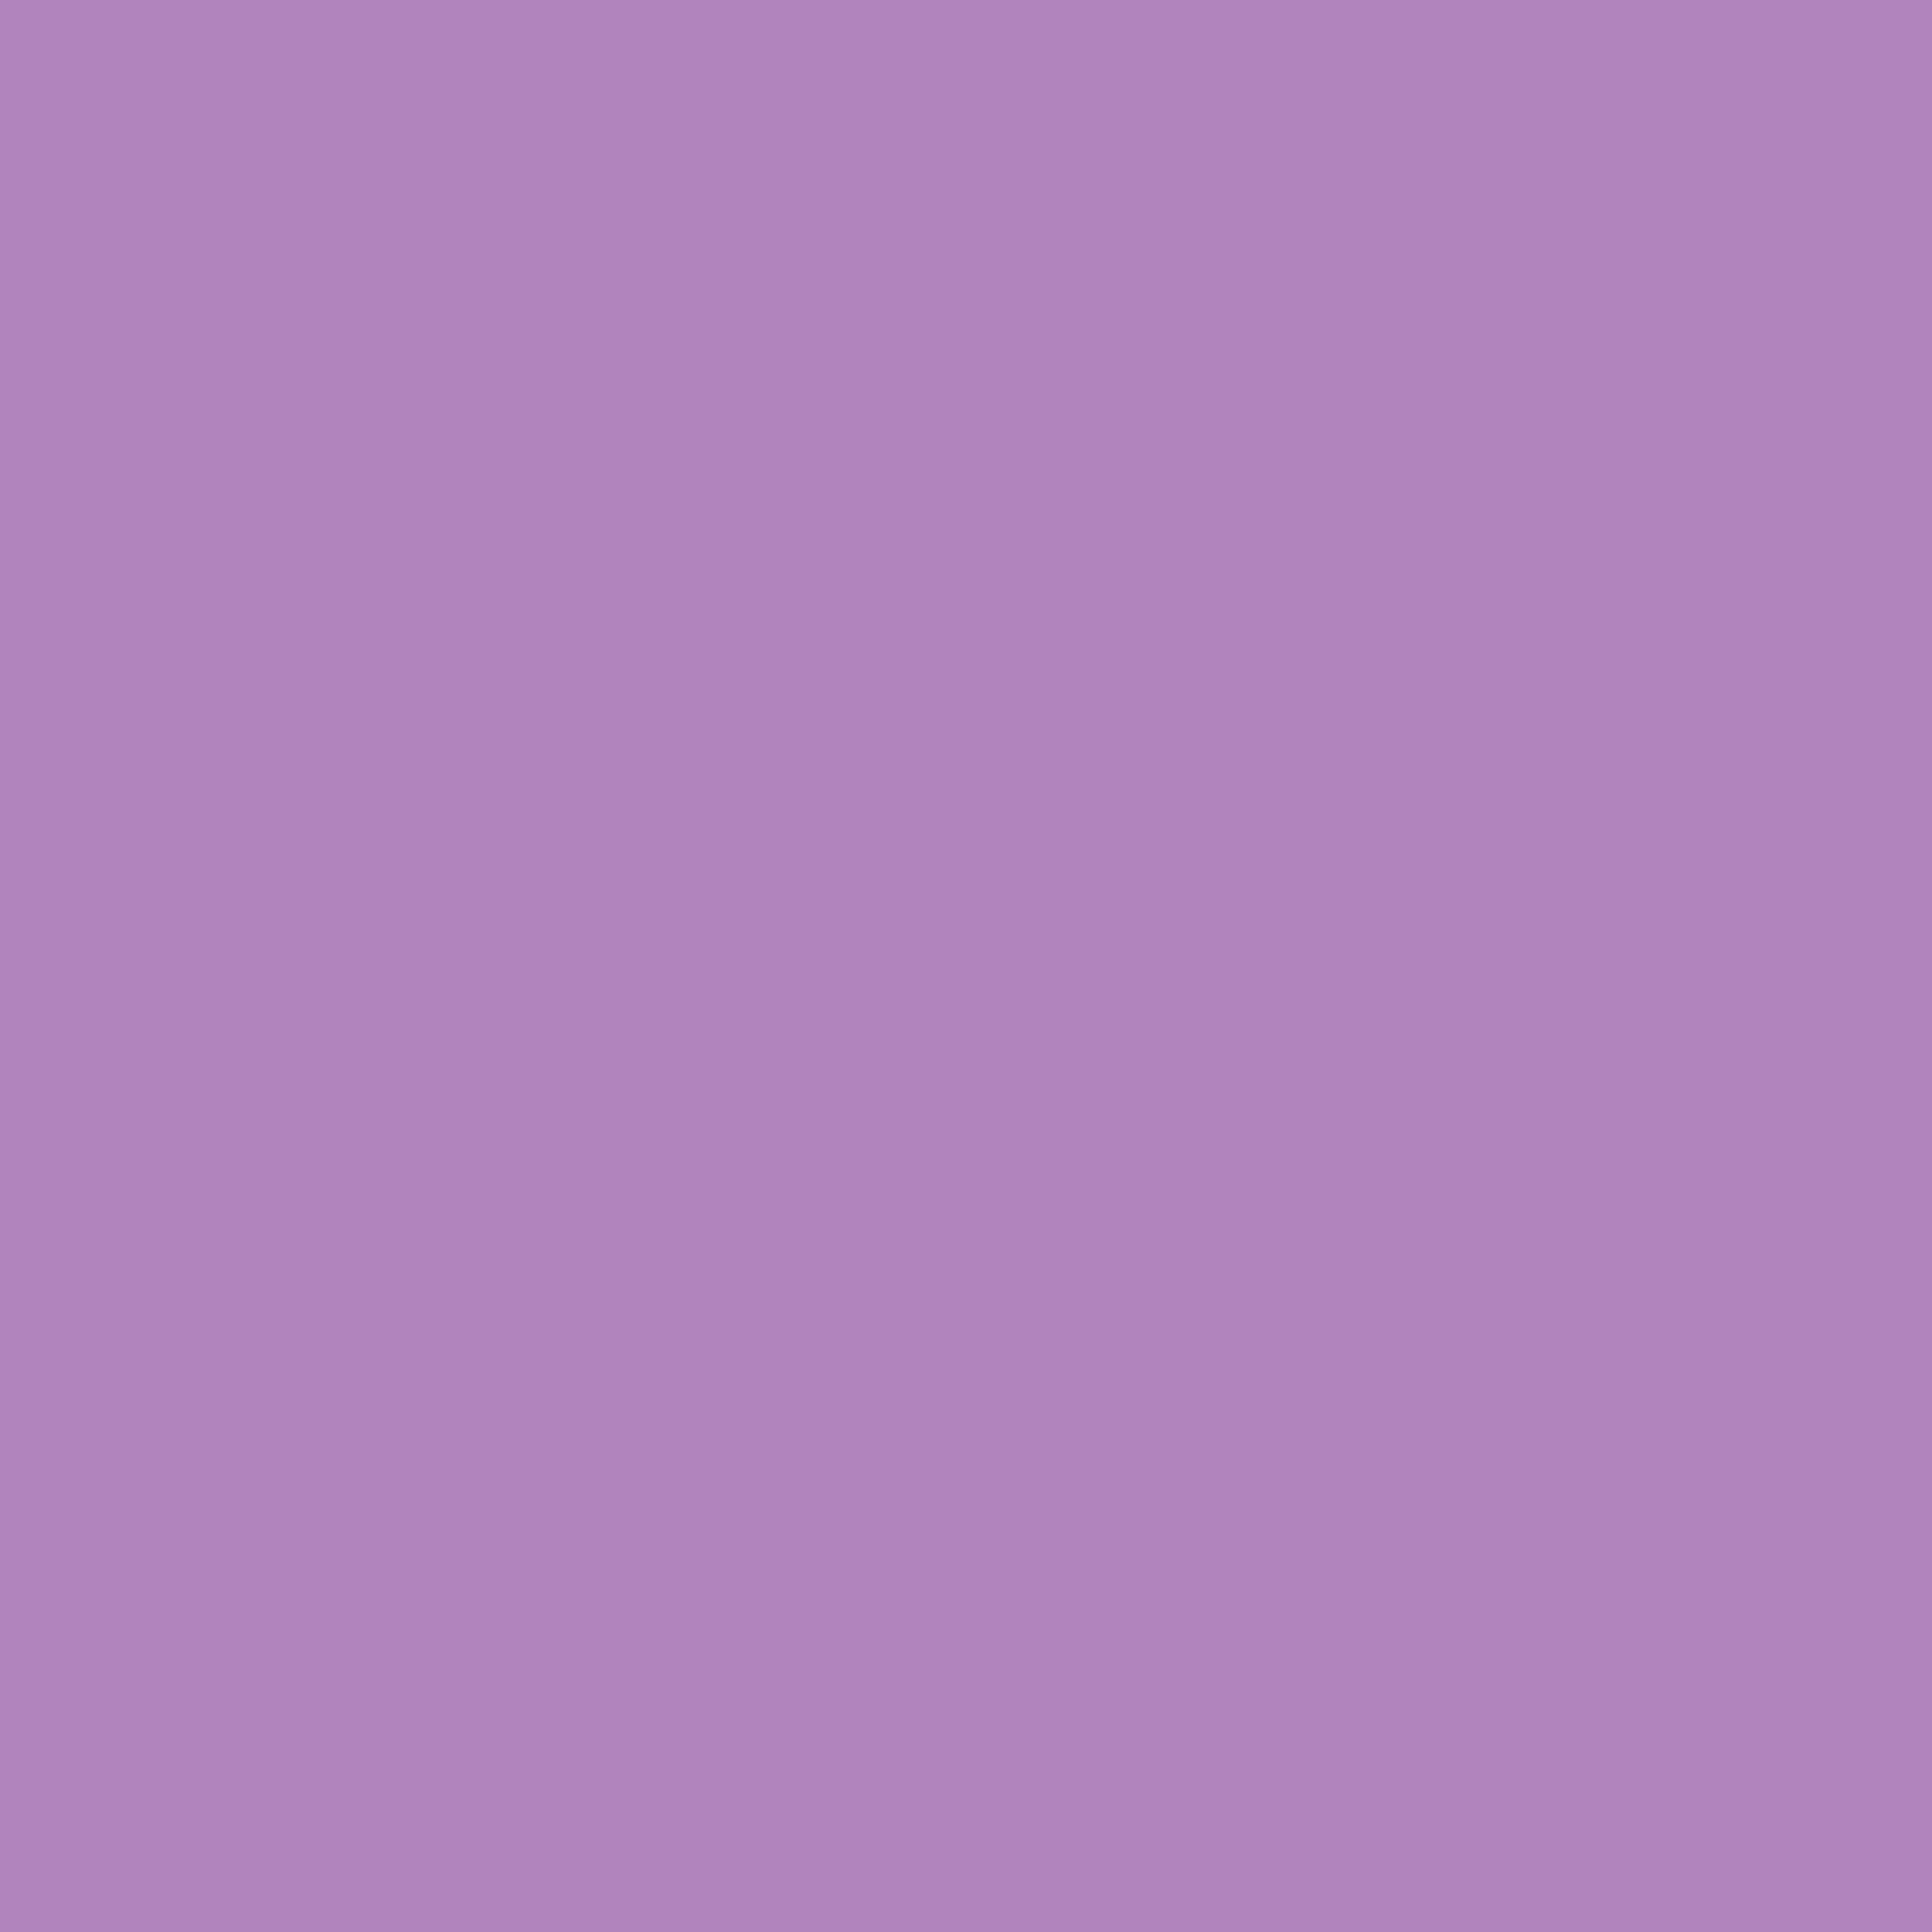 2048x2048 African Violet Solid Color Background